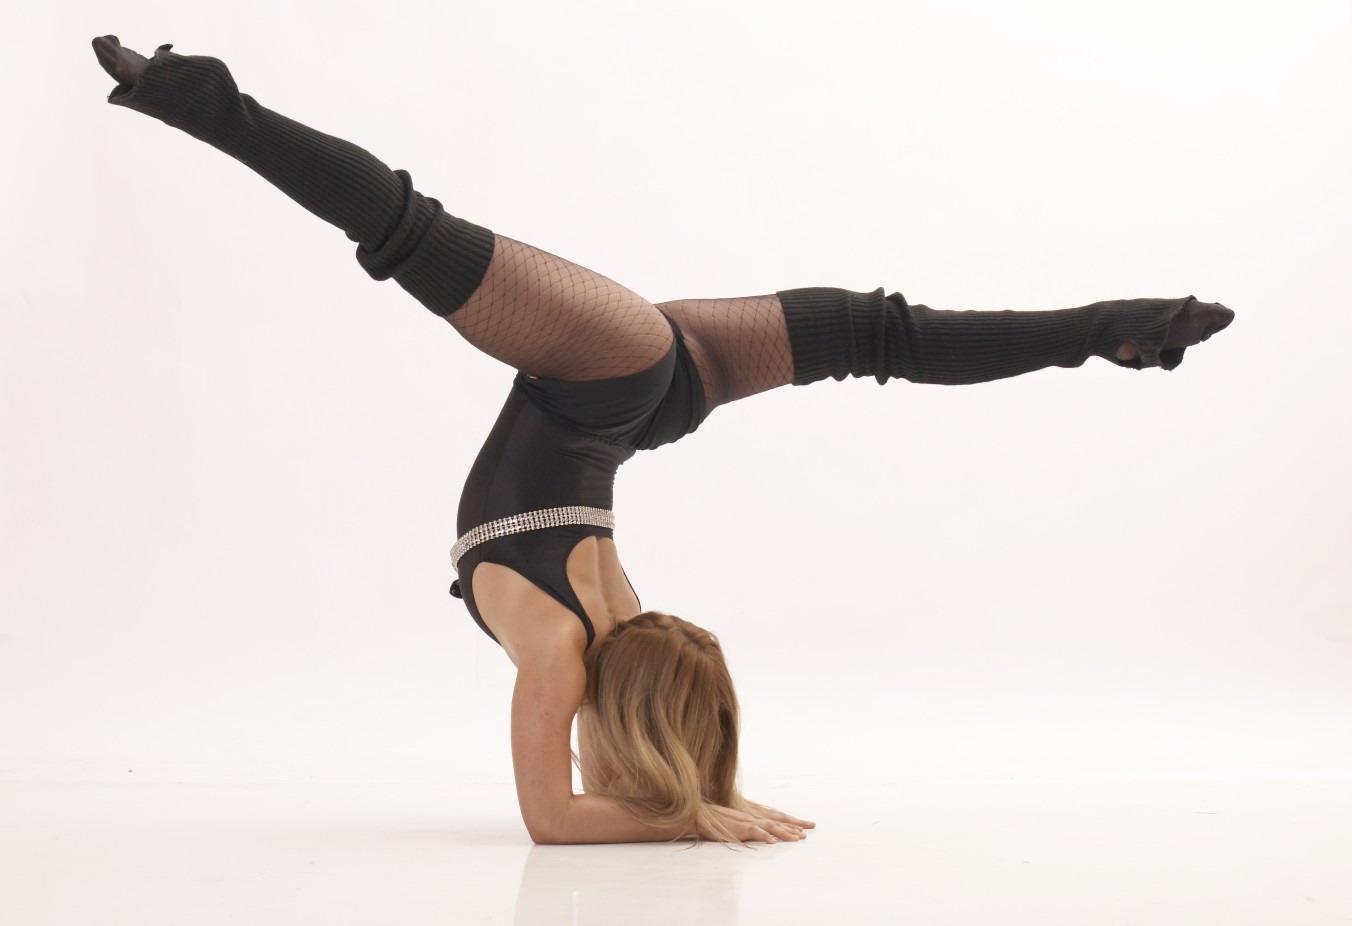 Танец с элементами стриптиза 19 фотография